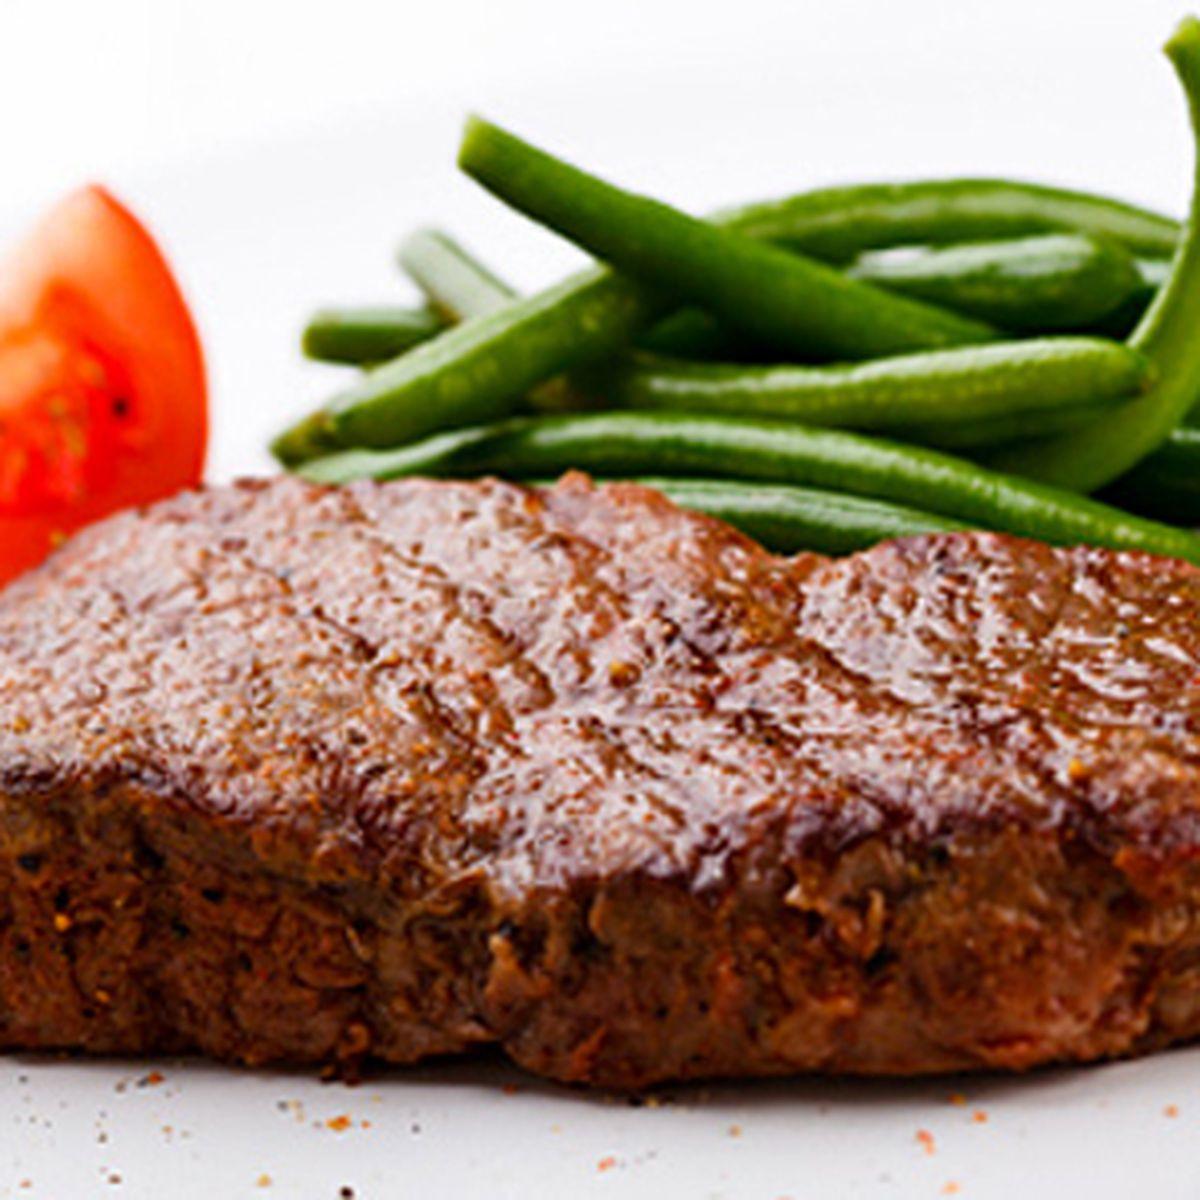 Girls boys petite sirloin steaks